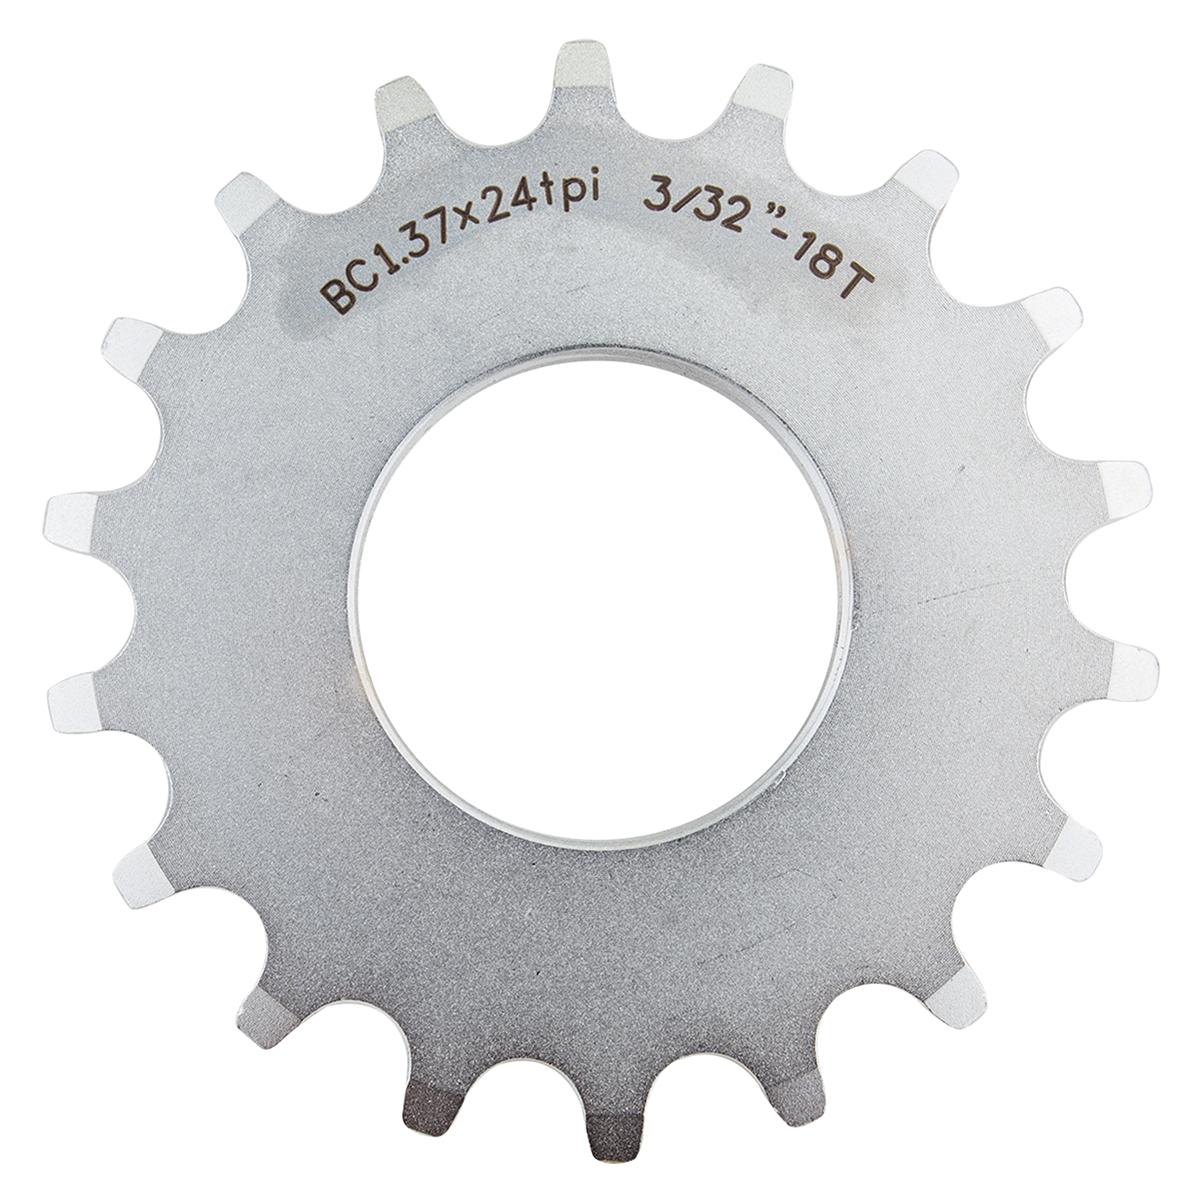 Origin-8 Fixed Gear Track Bike Cog 18Tx3/32